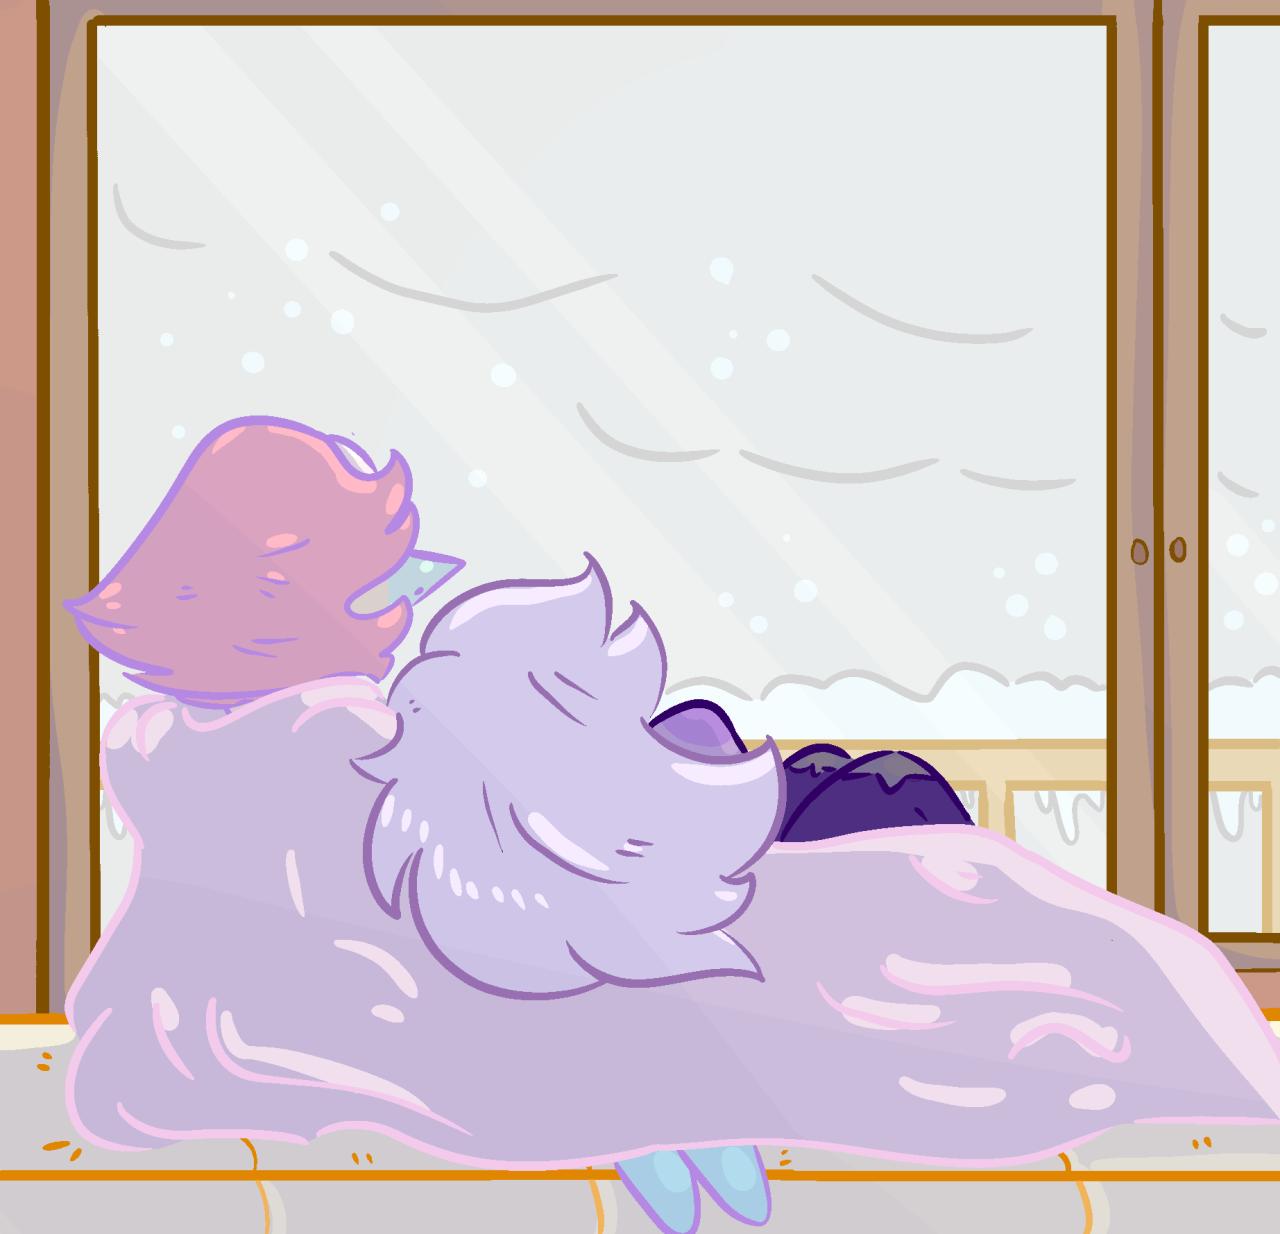 ❄️ Femslash February day 1: Snow ❄️